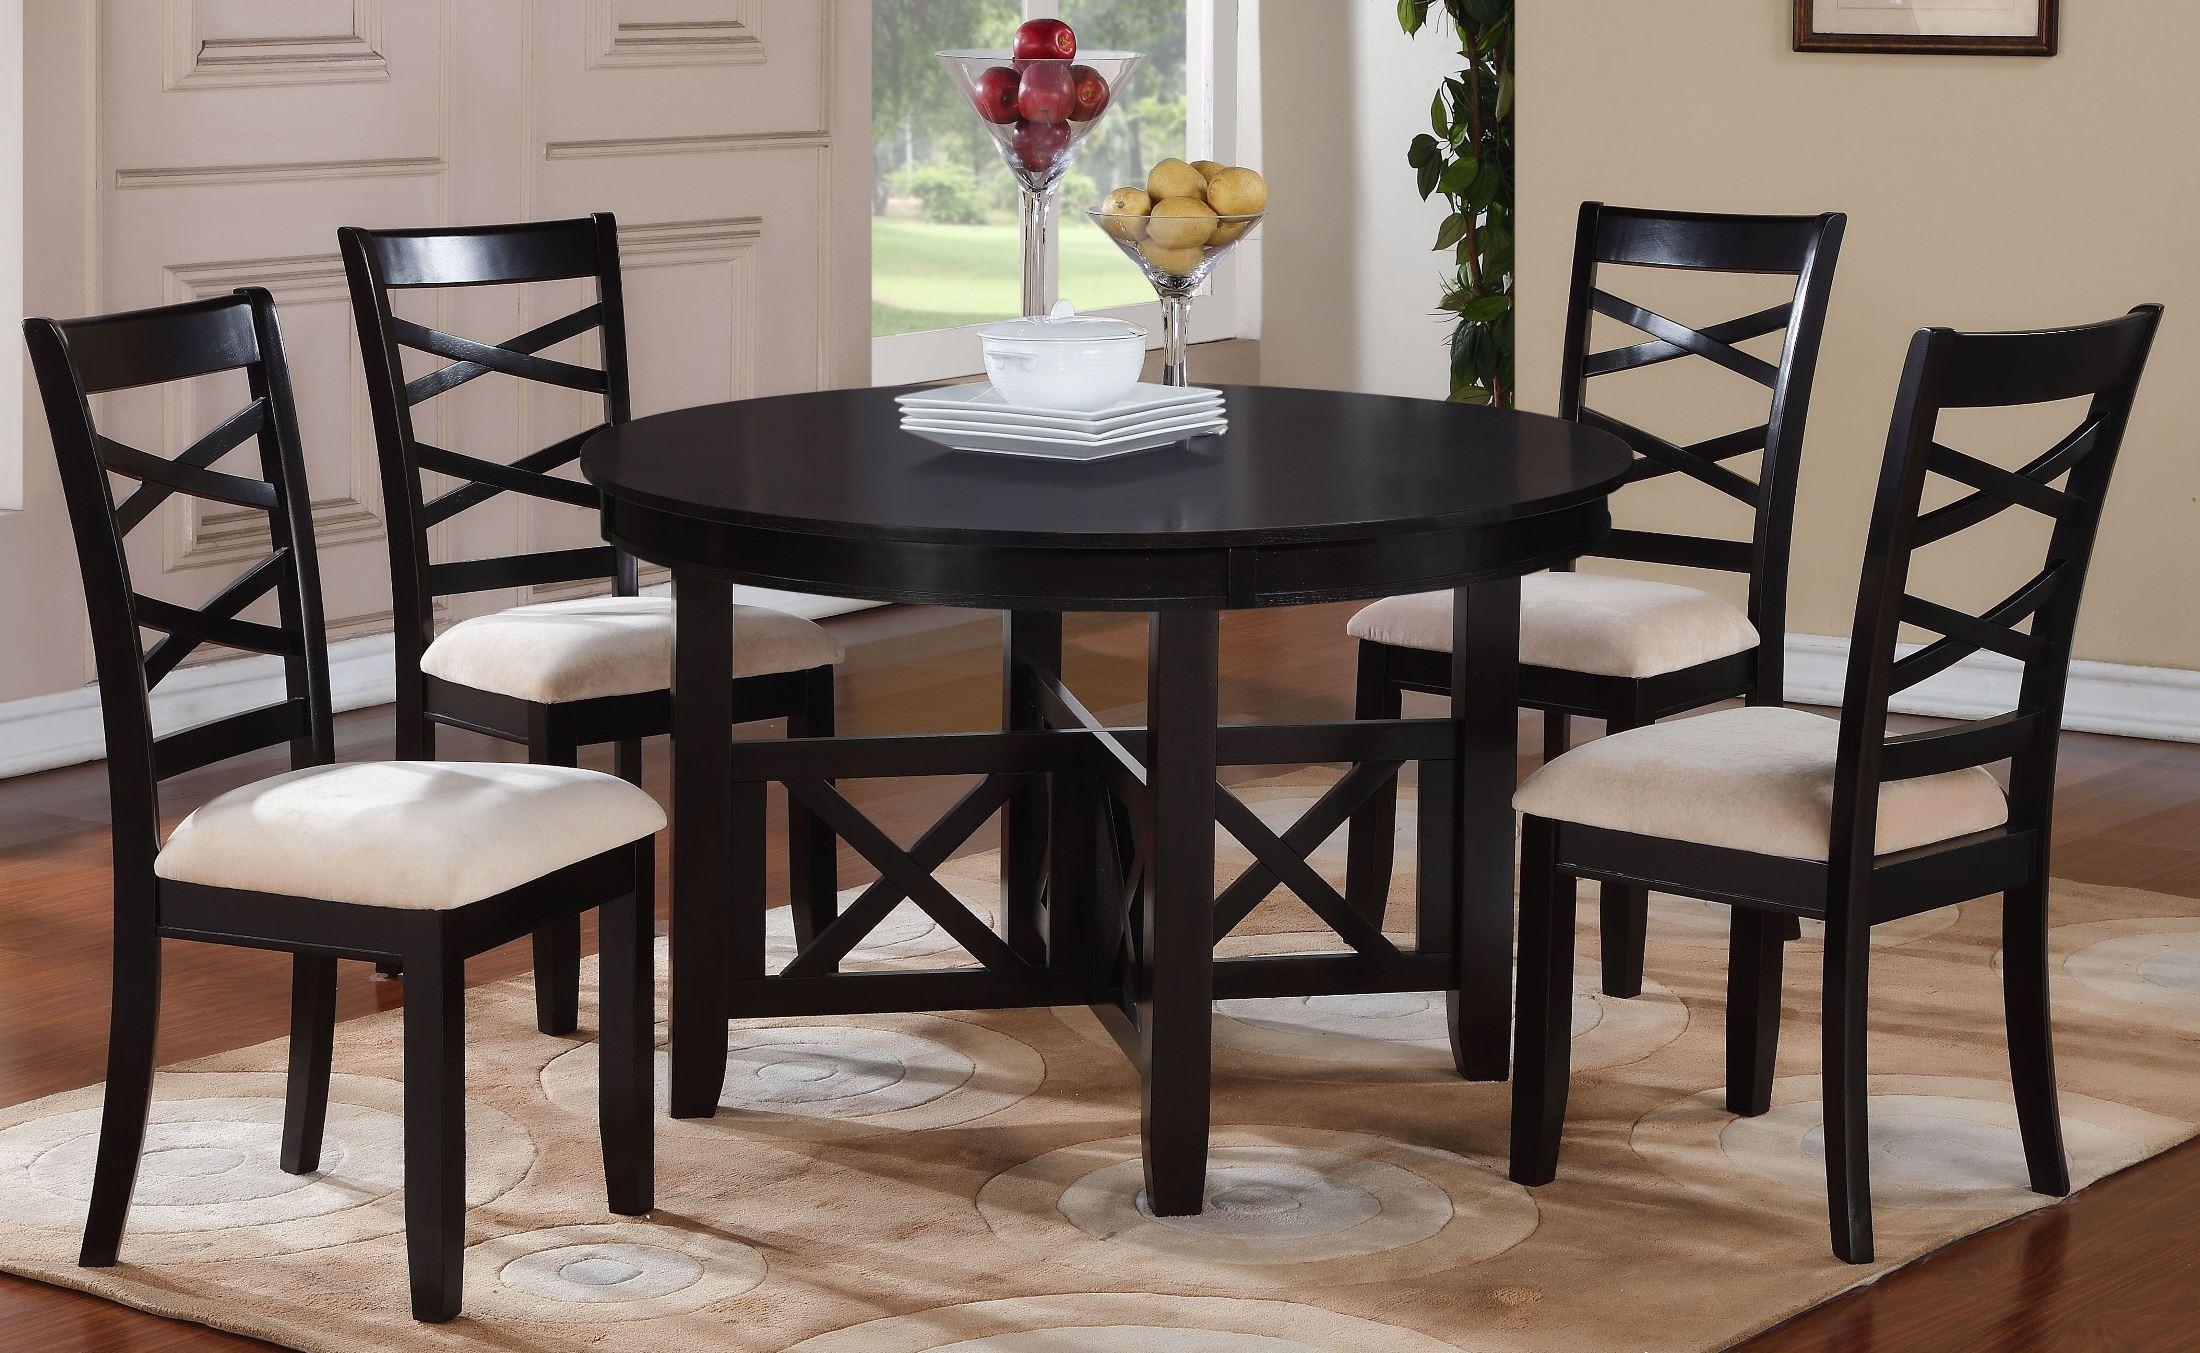 Epiphany dark java brown round dining room set 12542 for Brown dining room set